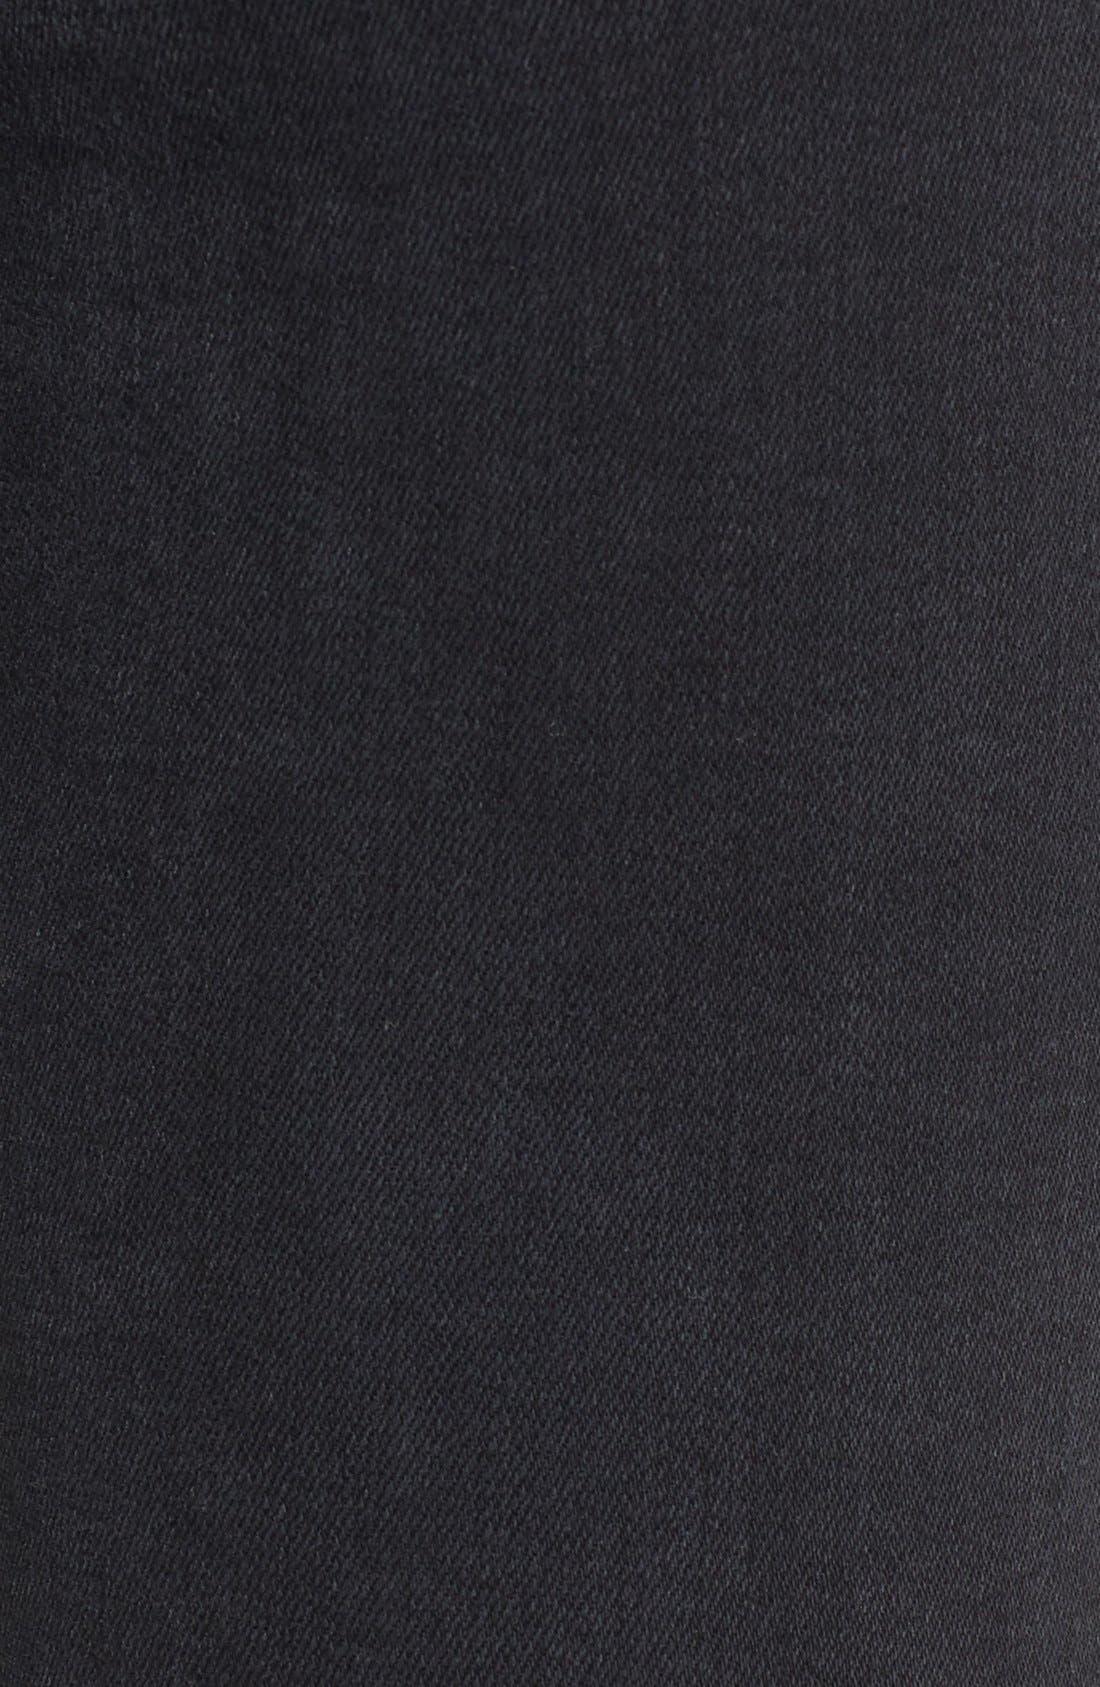 Alternate Image 5  - Hudson Jeans Barbara High Waist Super Skinny Jeans (Bazooka)